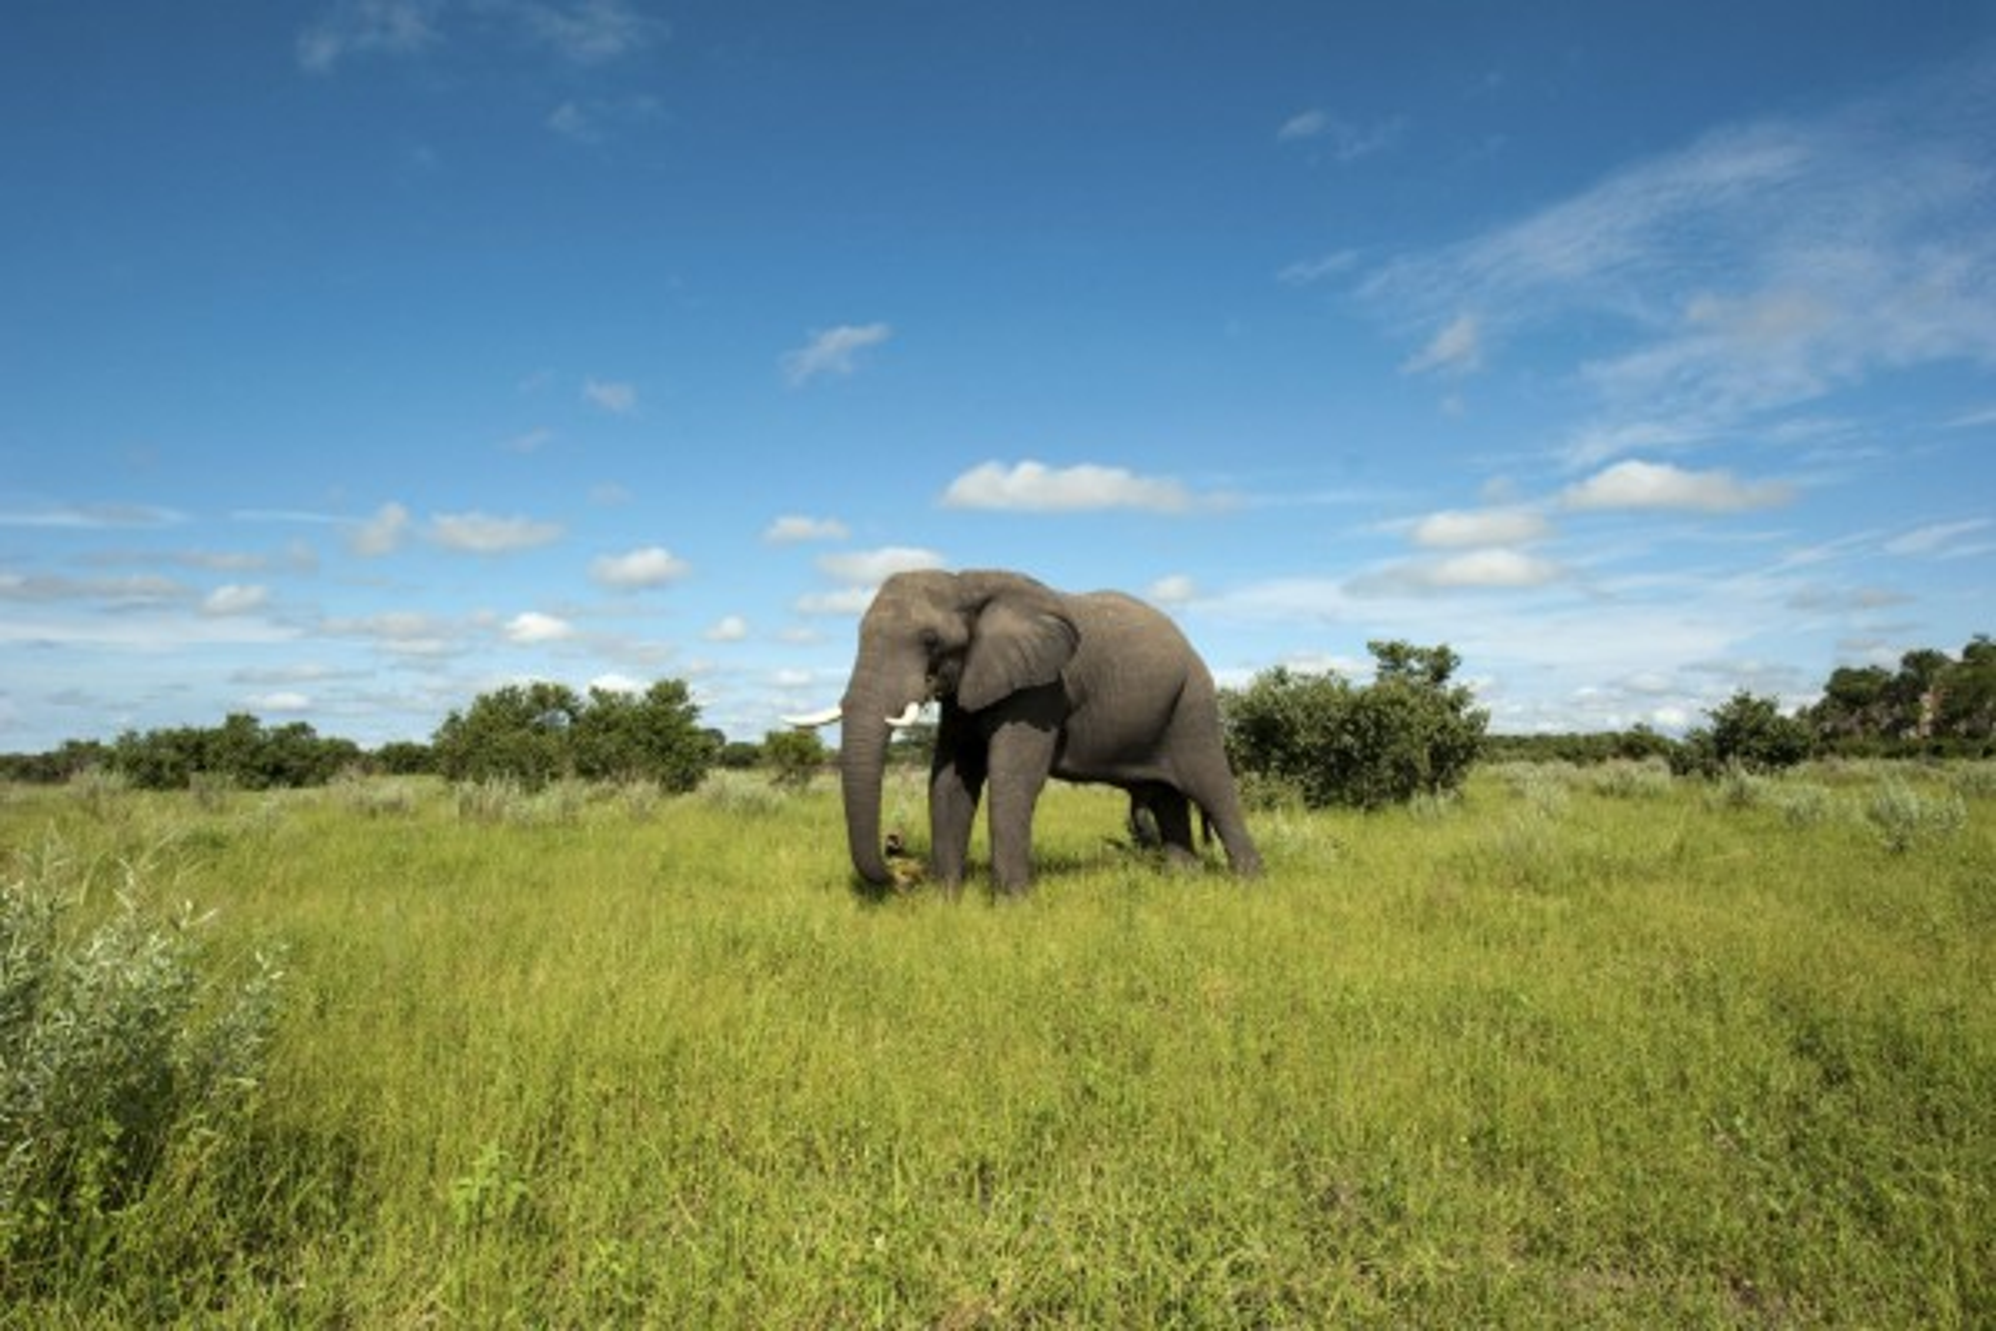 An elephant in Chobe National Park, Botswana